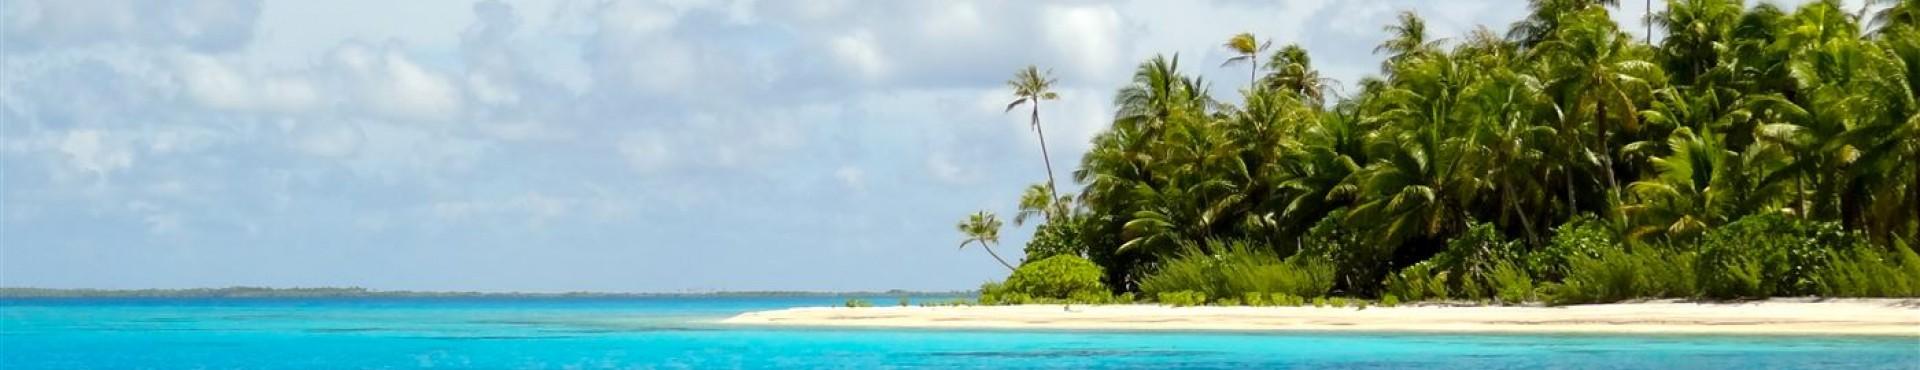 Fakarava urlaub im s dseeparadies polynesia select - Rangiroa urlaub ...